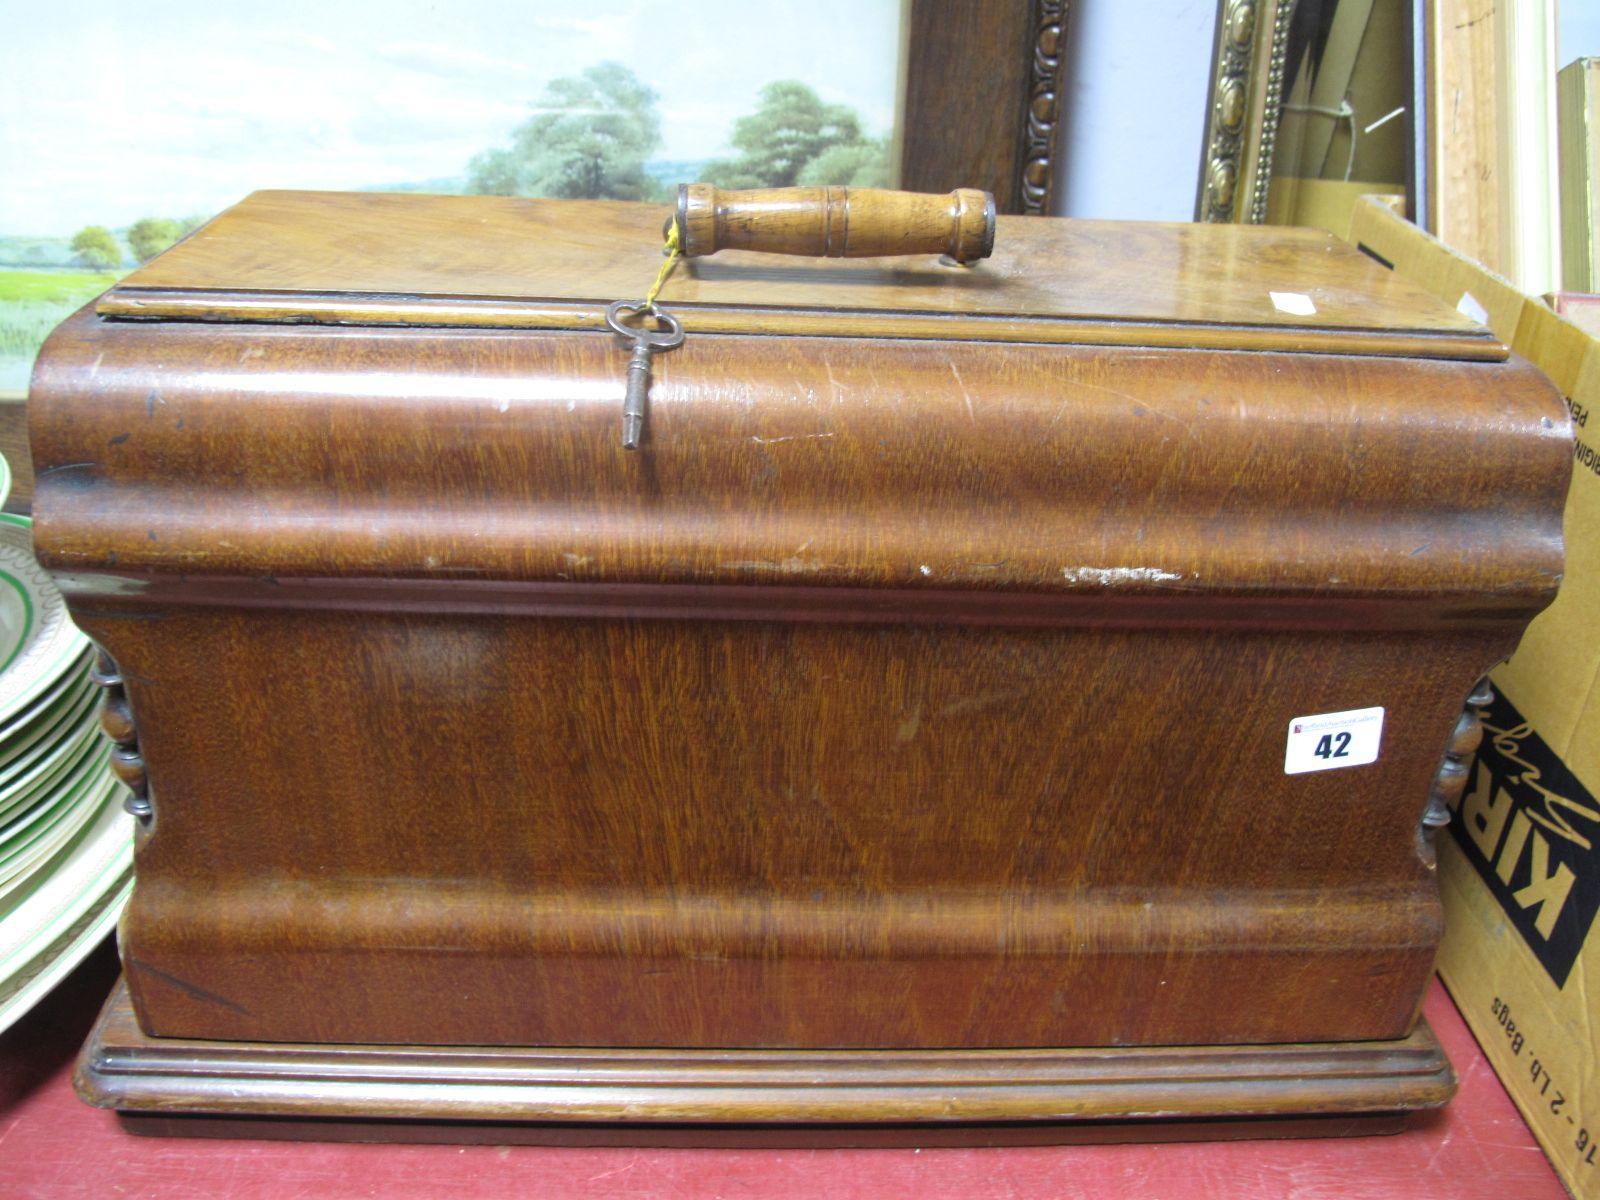 Lot 42 - A Jones Sewing Machine and Accessories, in walnut case.